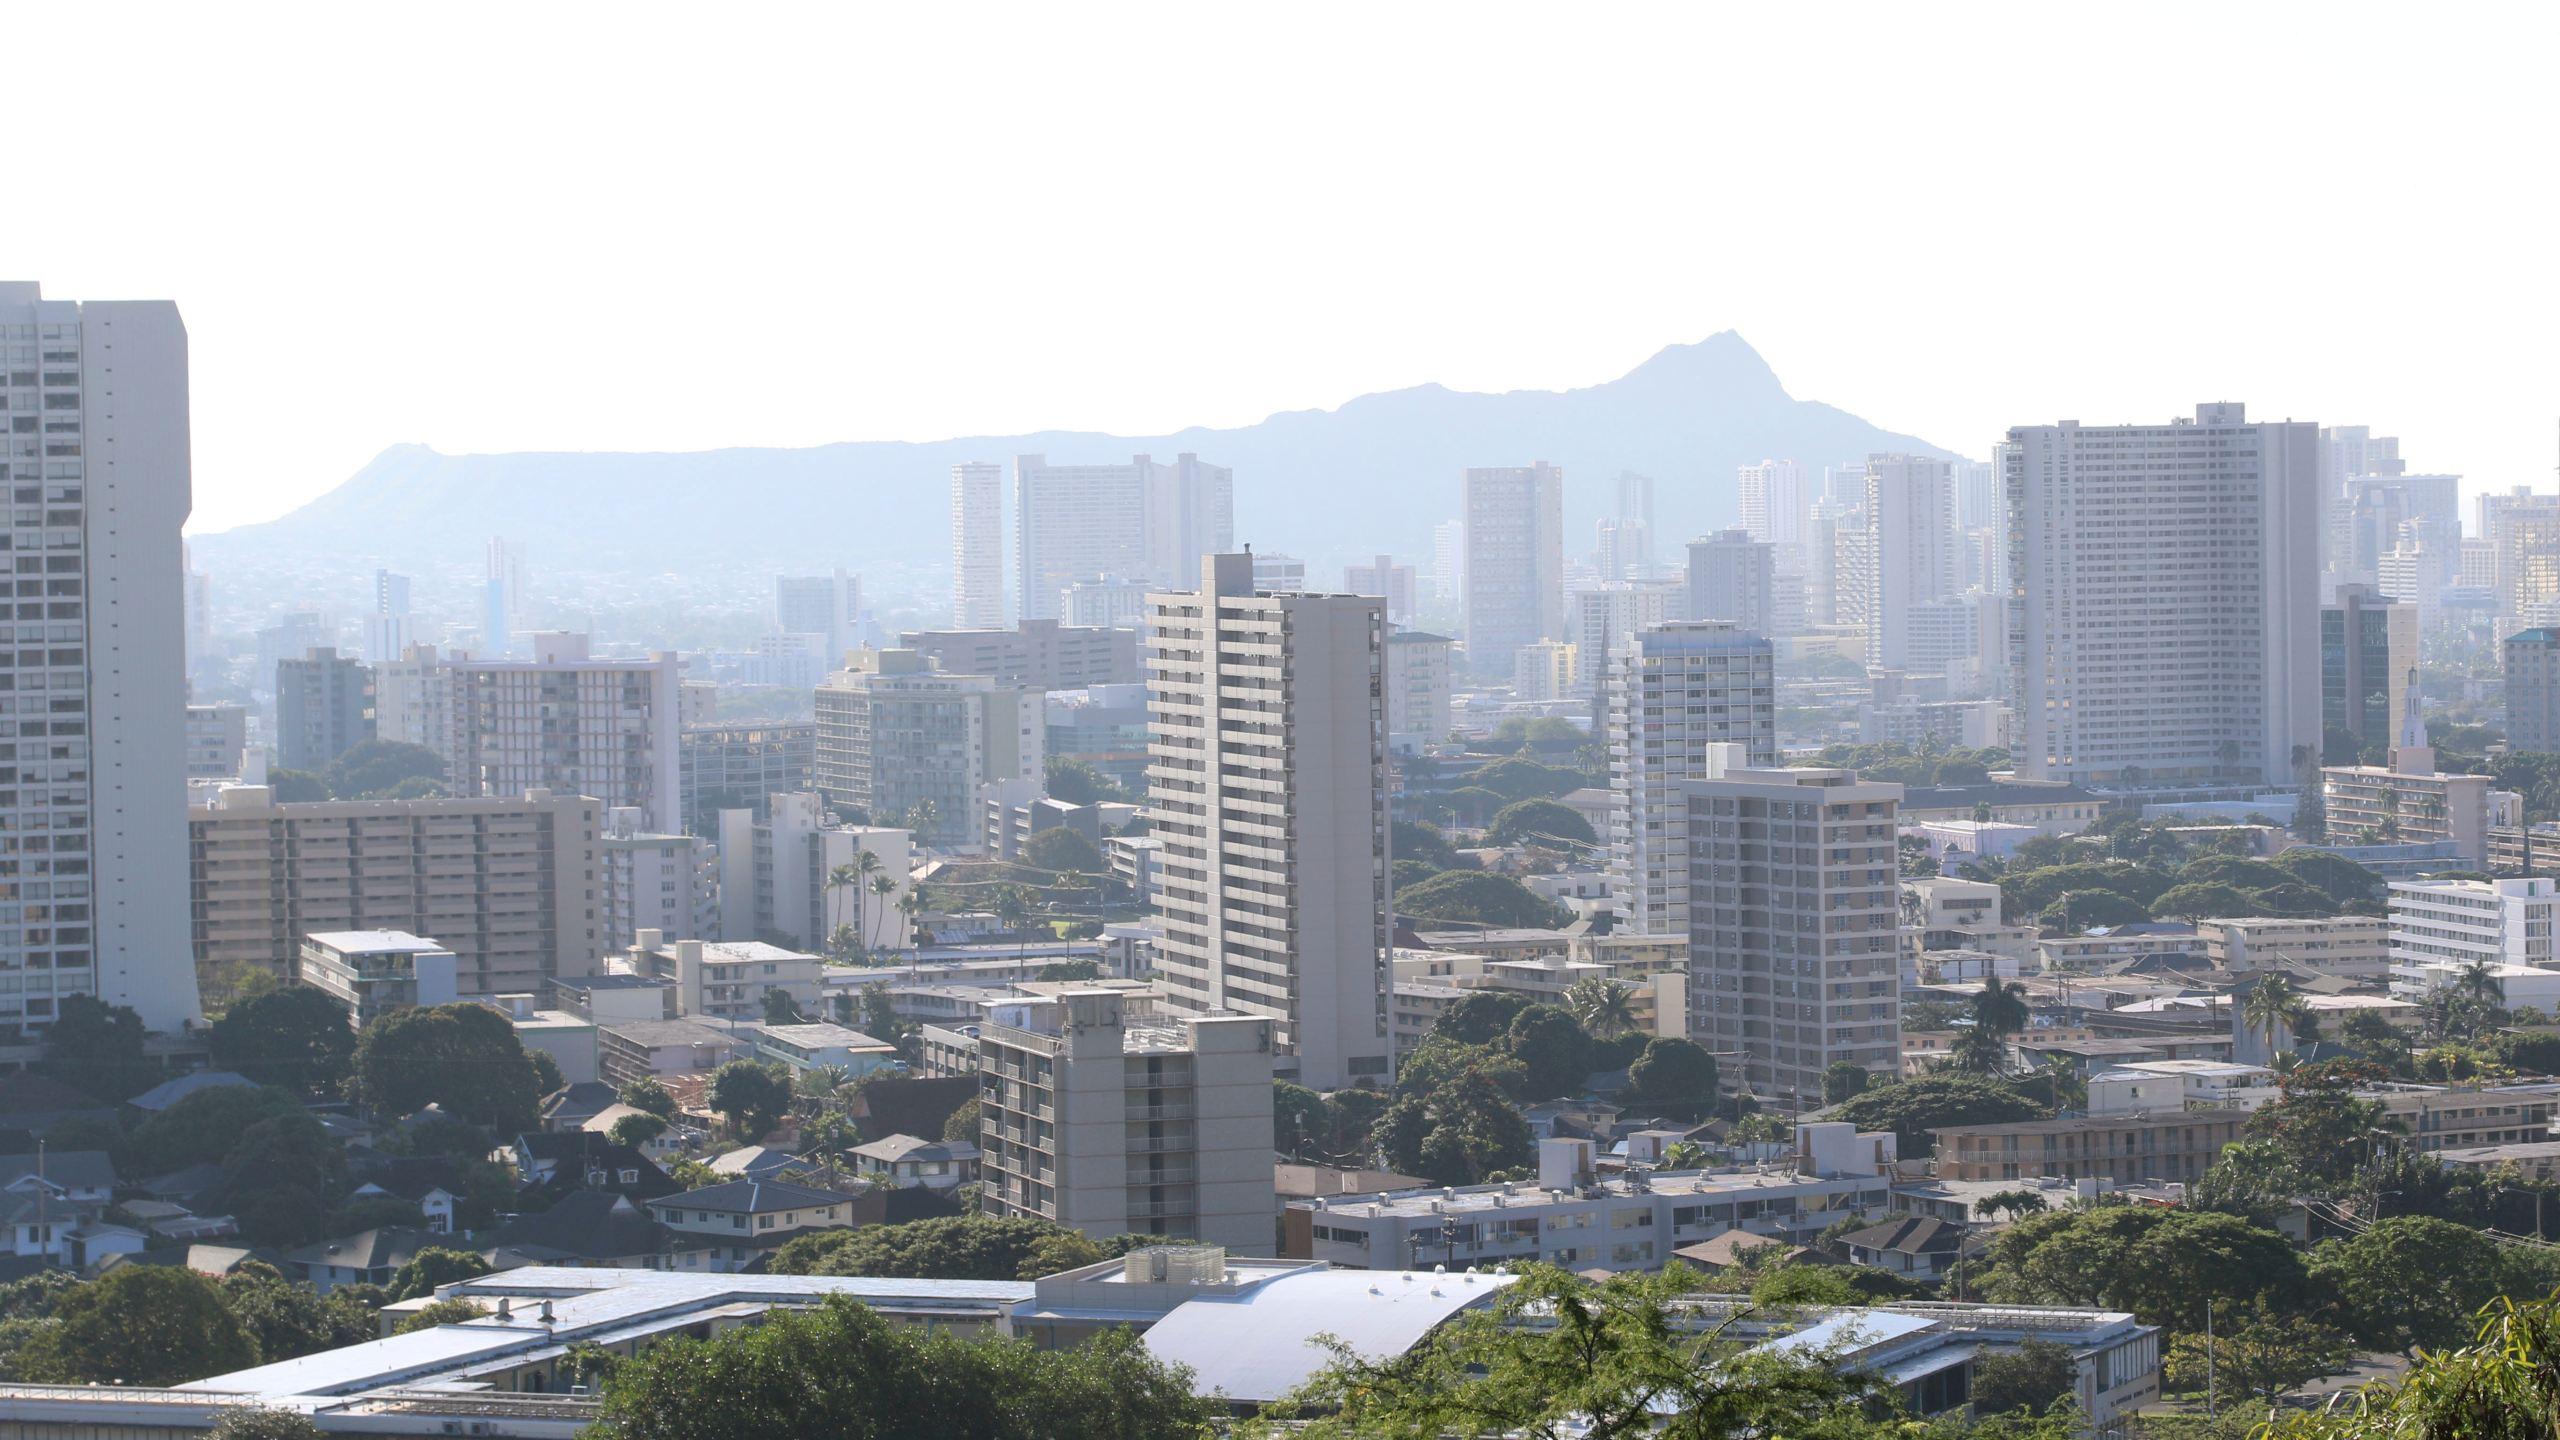 Hawaii-Mistaken_Missile_Alert_81109-159532.jpg88230357